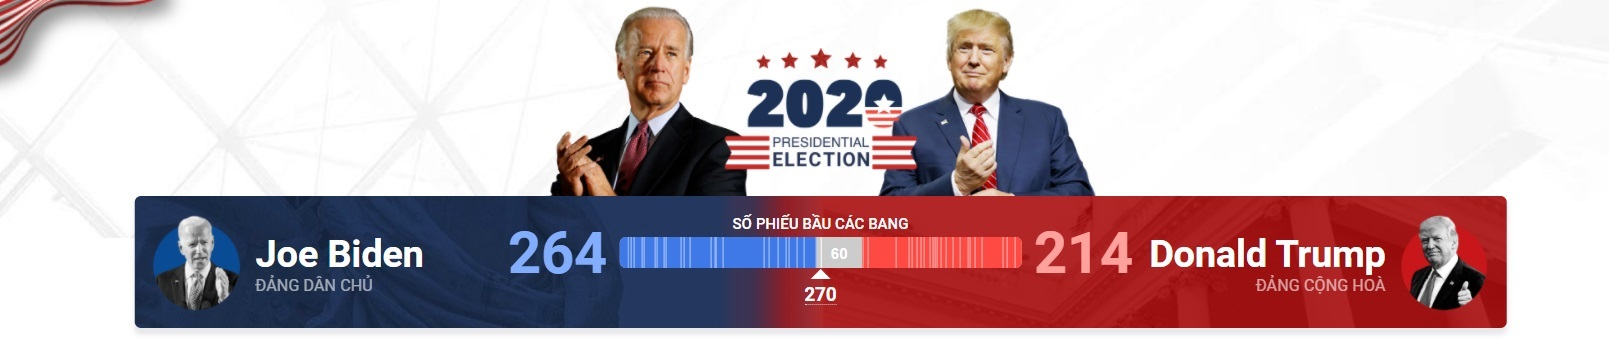 bầu cử hoa kỳ 2020